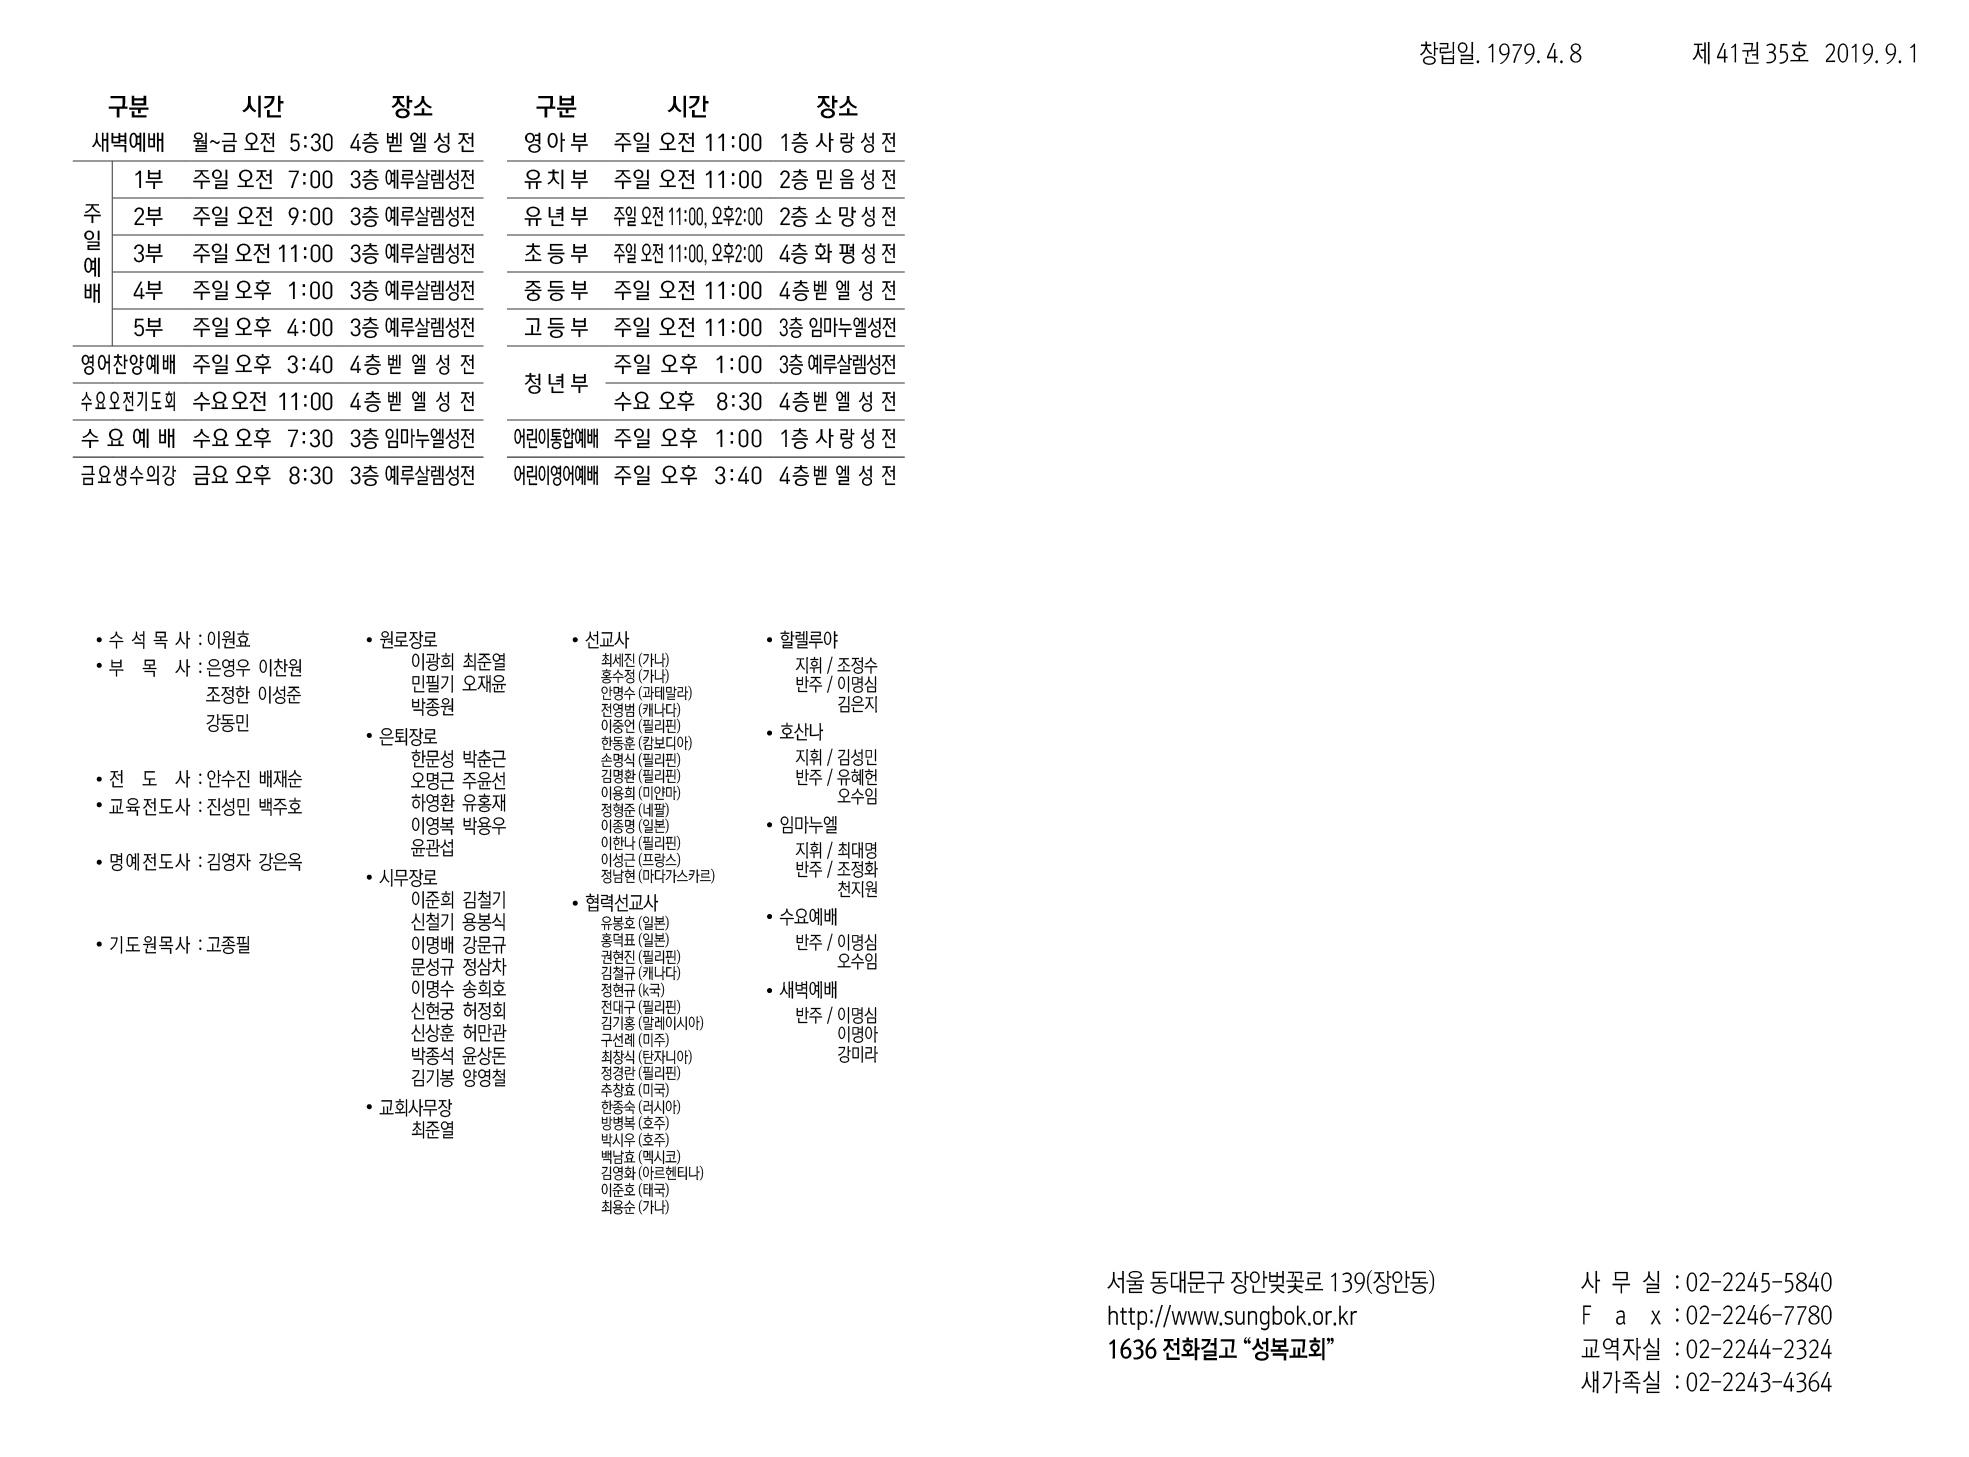 183f3028c4e57aa9fdee503c15330c62.jpg